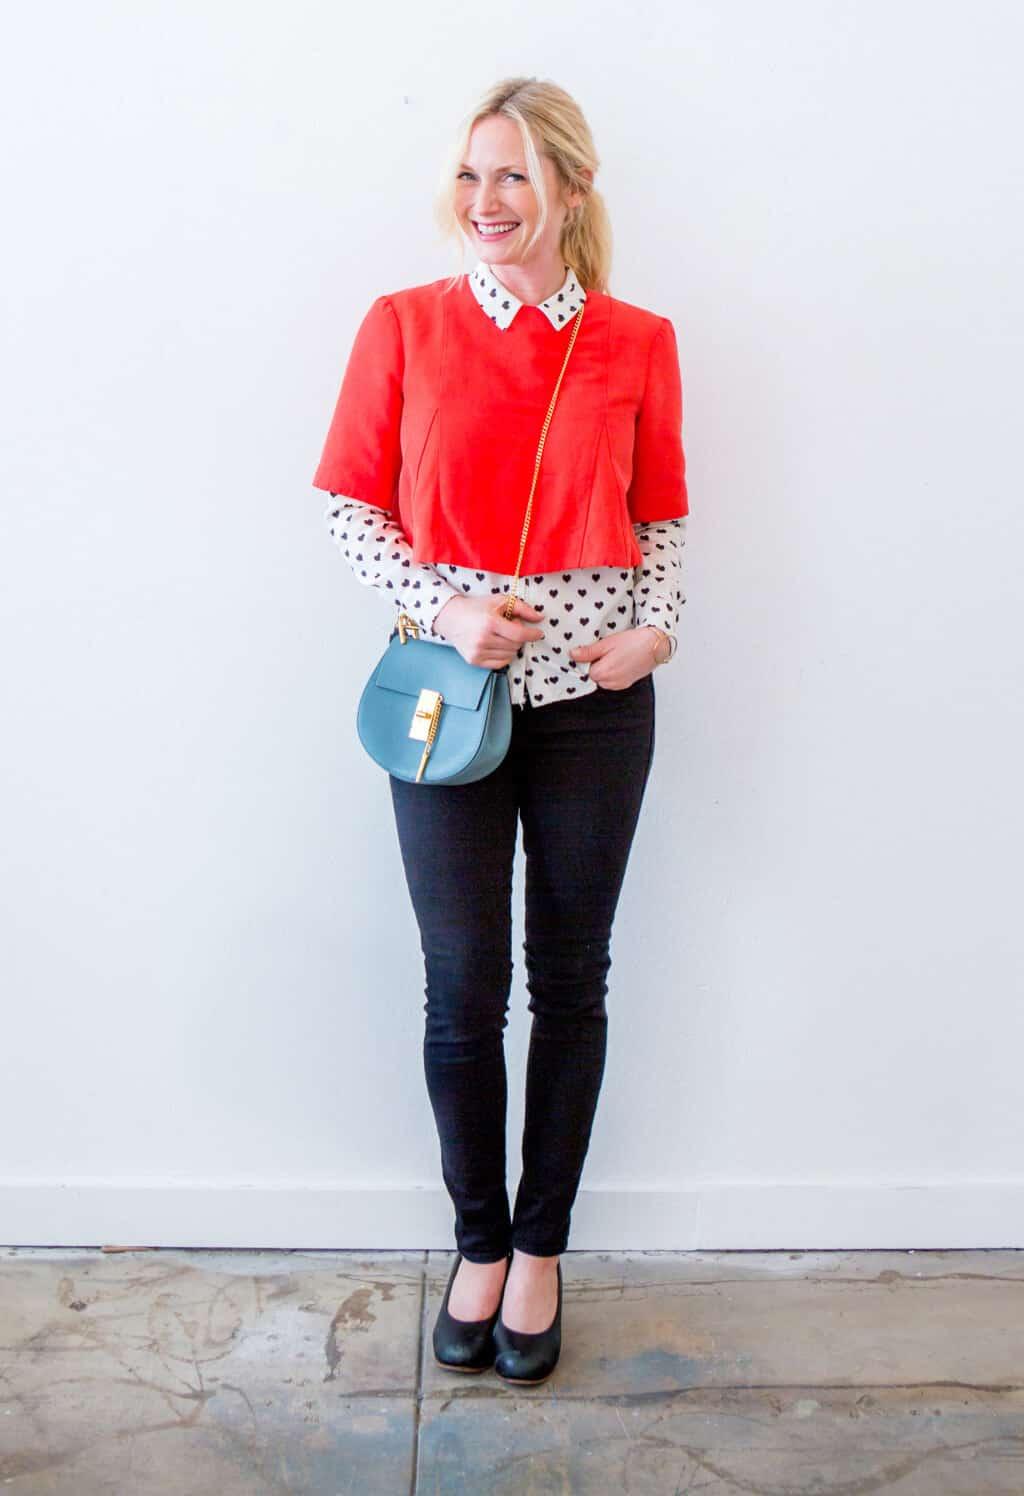 emily-henderson_trendlee_fashion_handbags_blog-photos_8